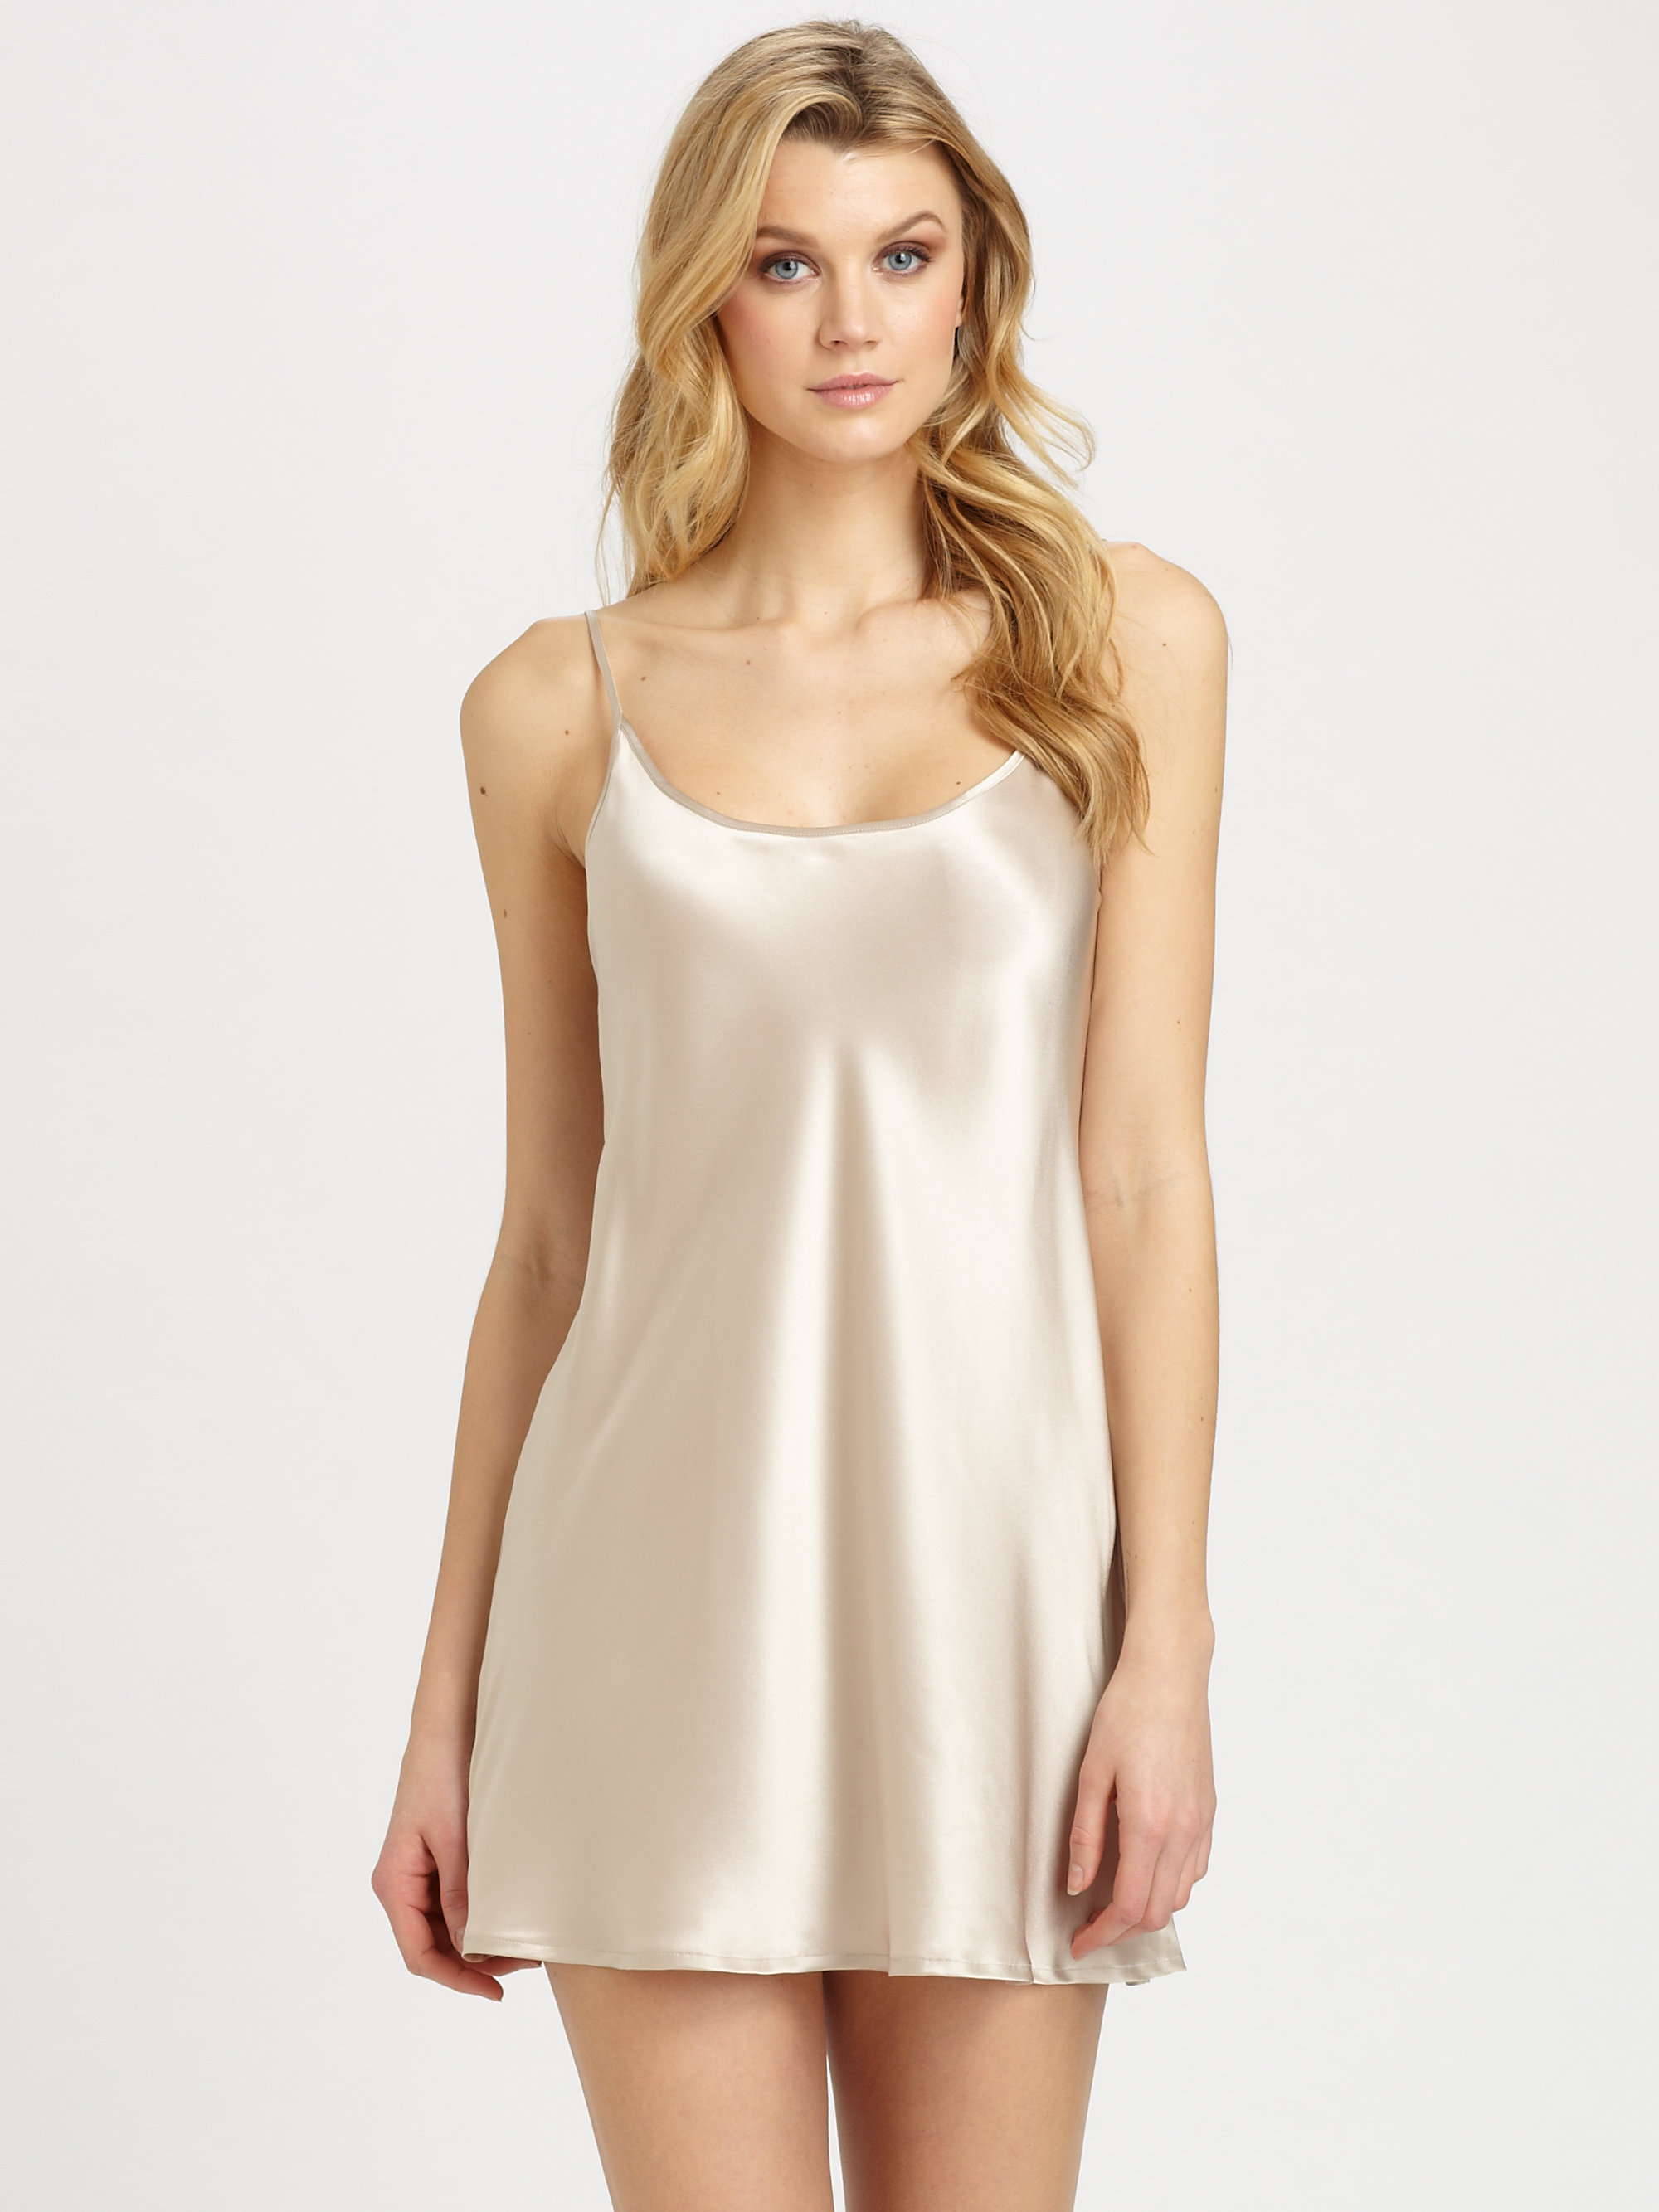 La Perla Silk Charmeuse Chemise in Nude (Natural) - Lyst